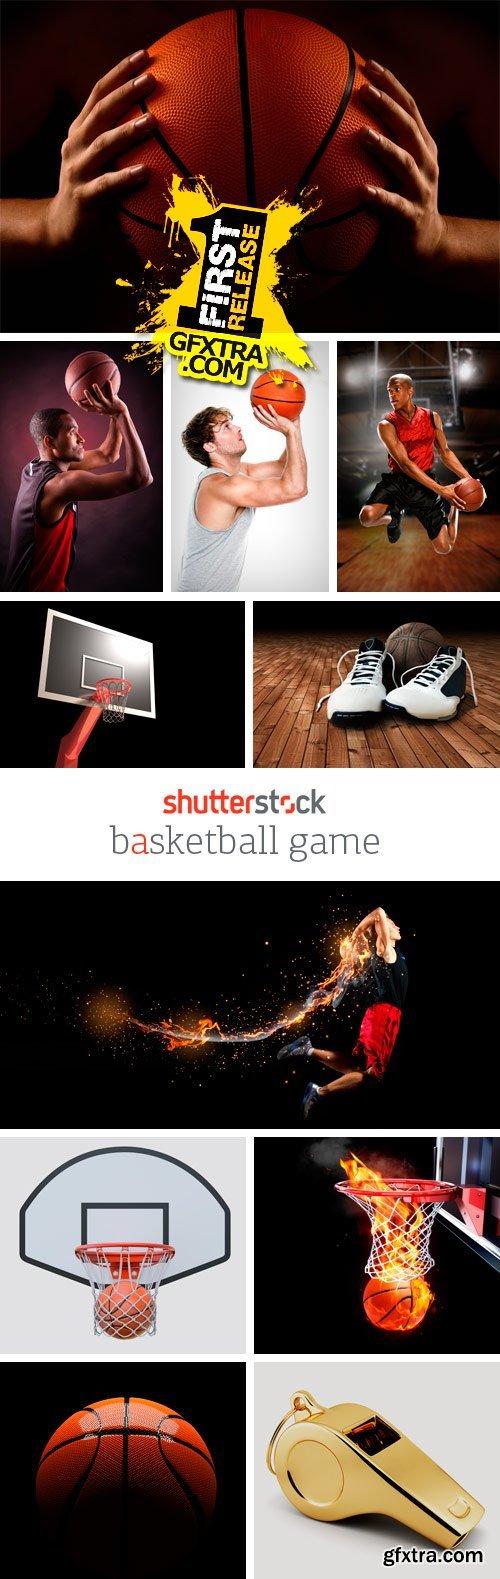 Amazing SS - Basketball Game, 25xJPGs